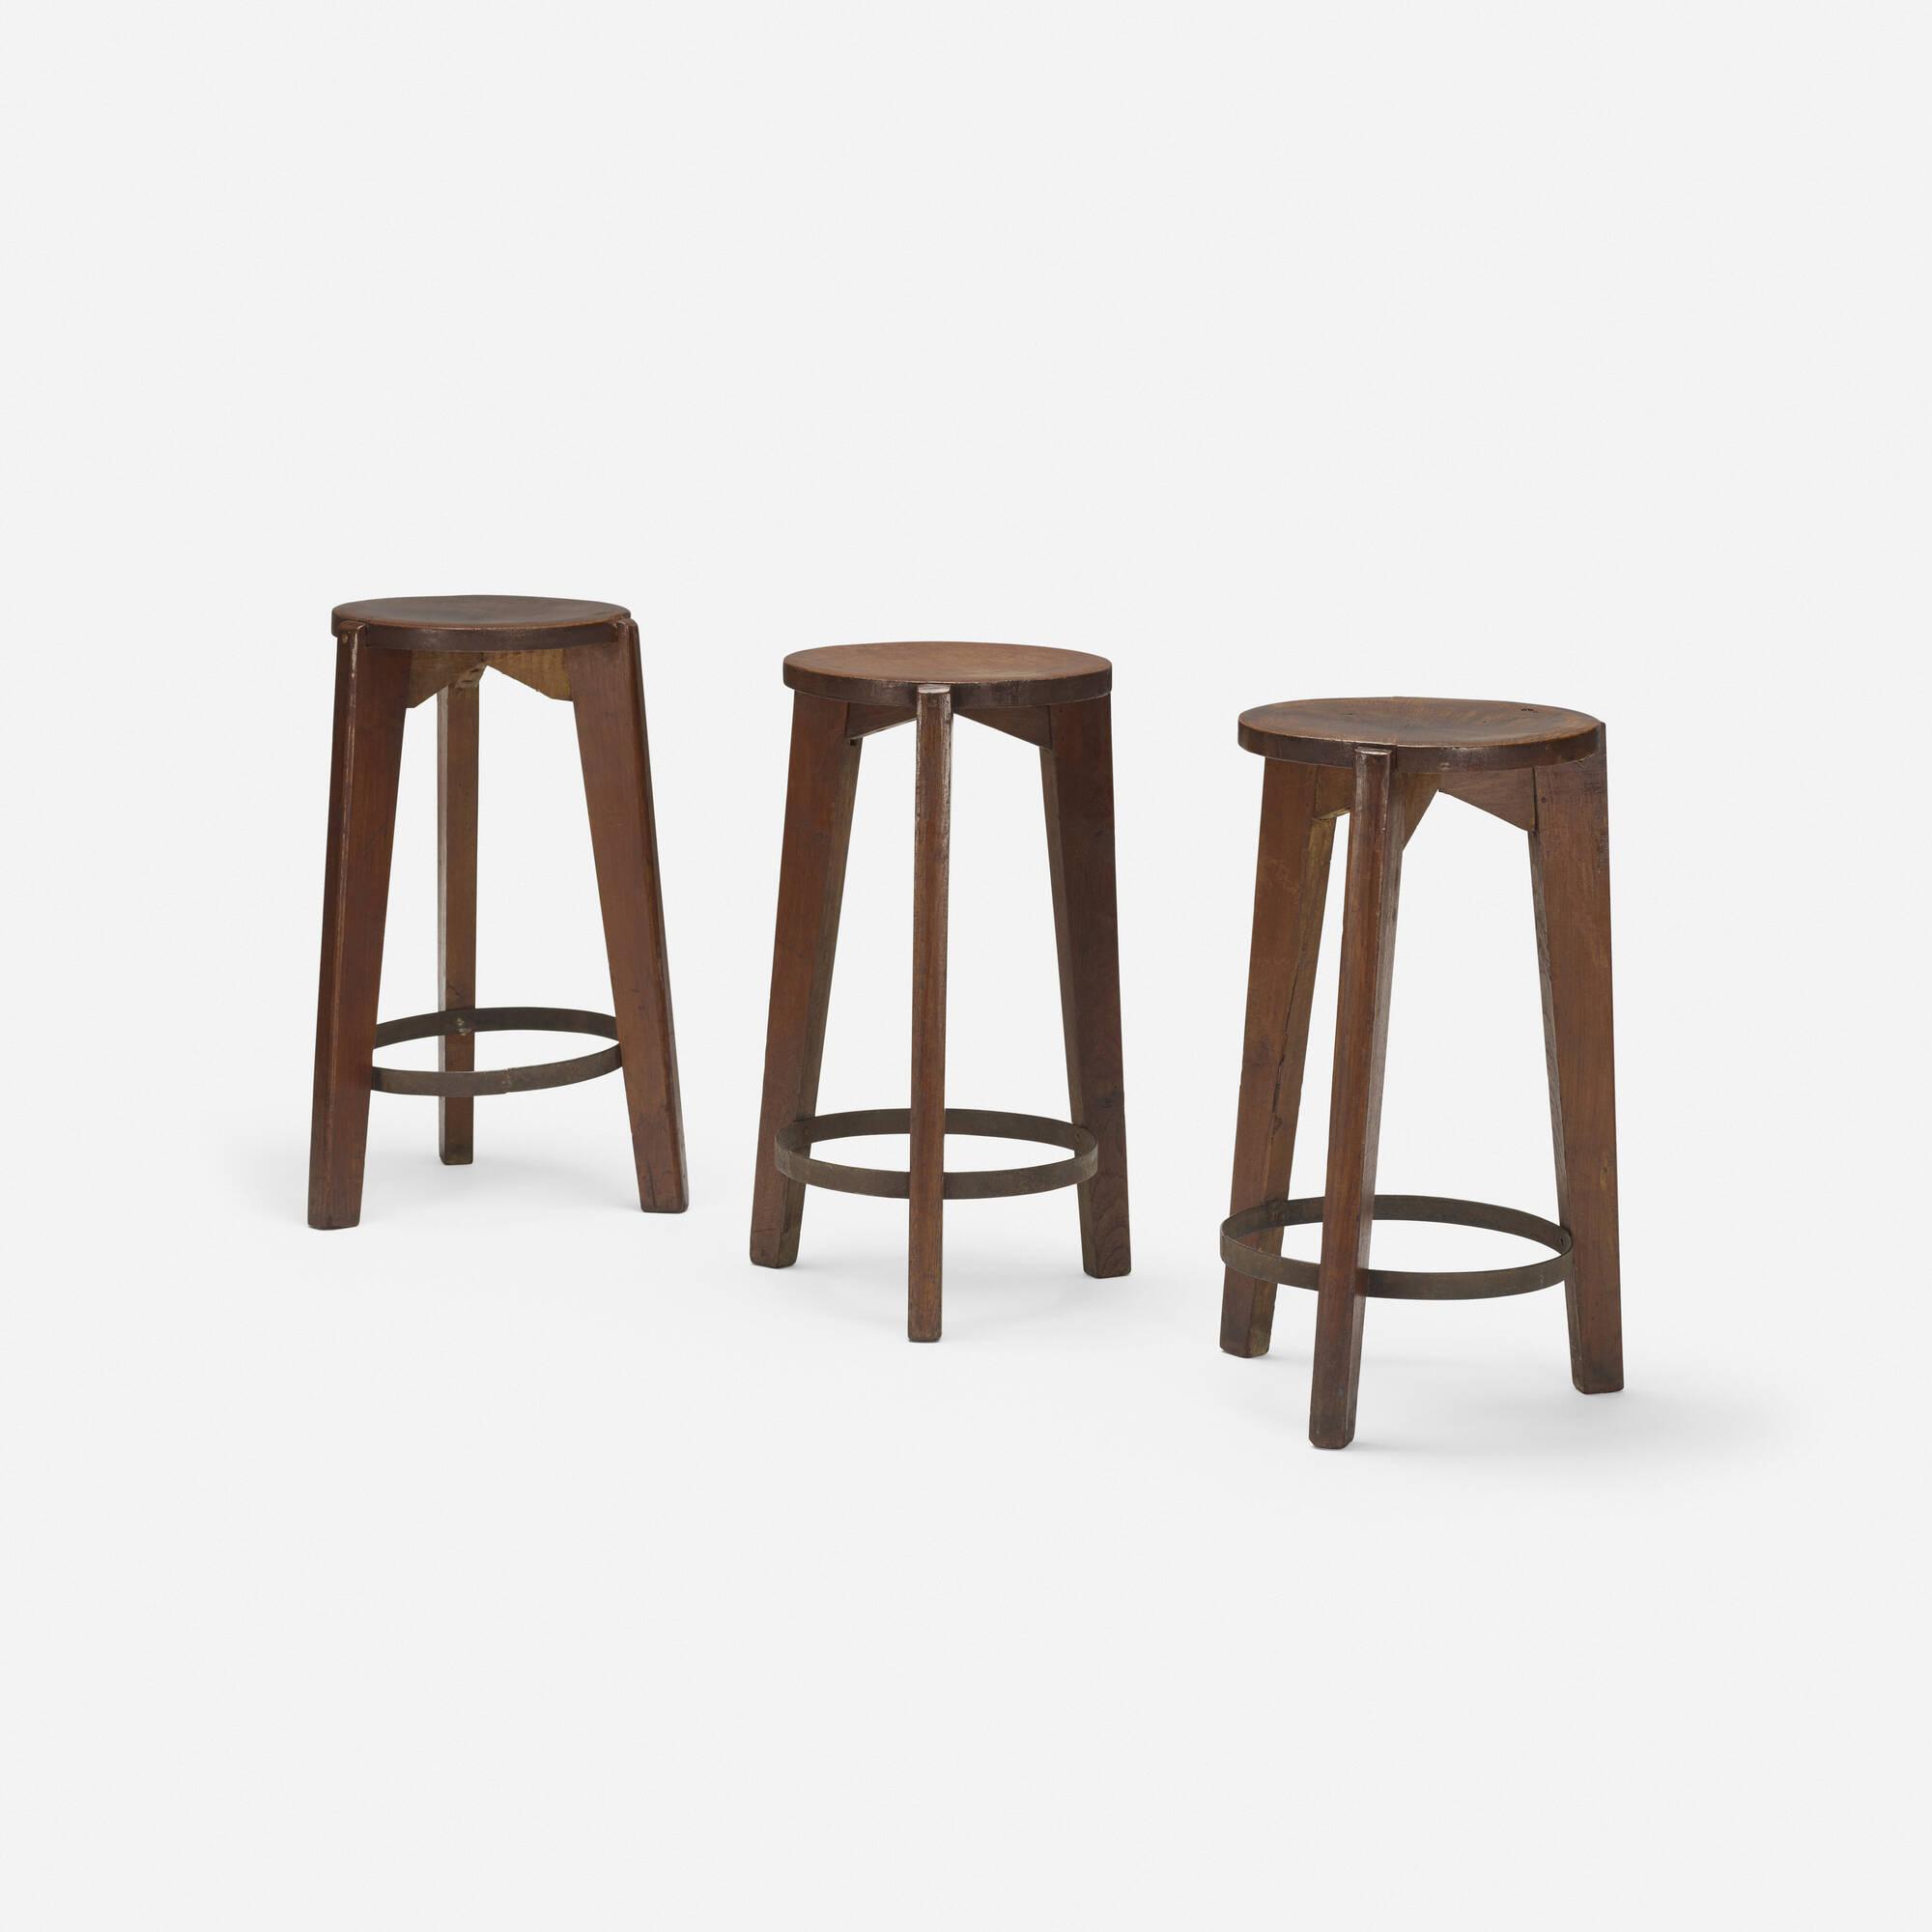 109: Pierre Jeanneret / set of three stools from Punjab University, Chandigarh (1 of 2)